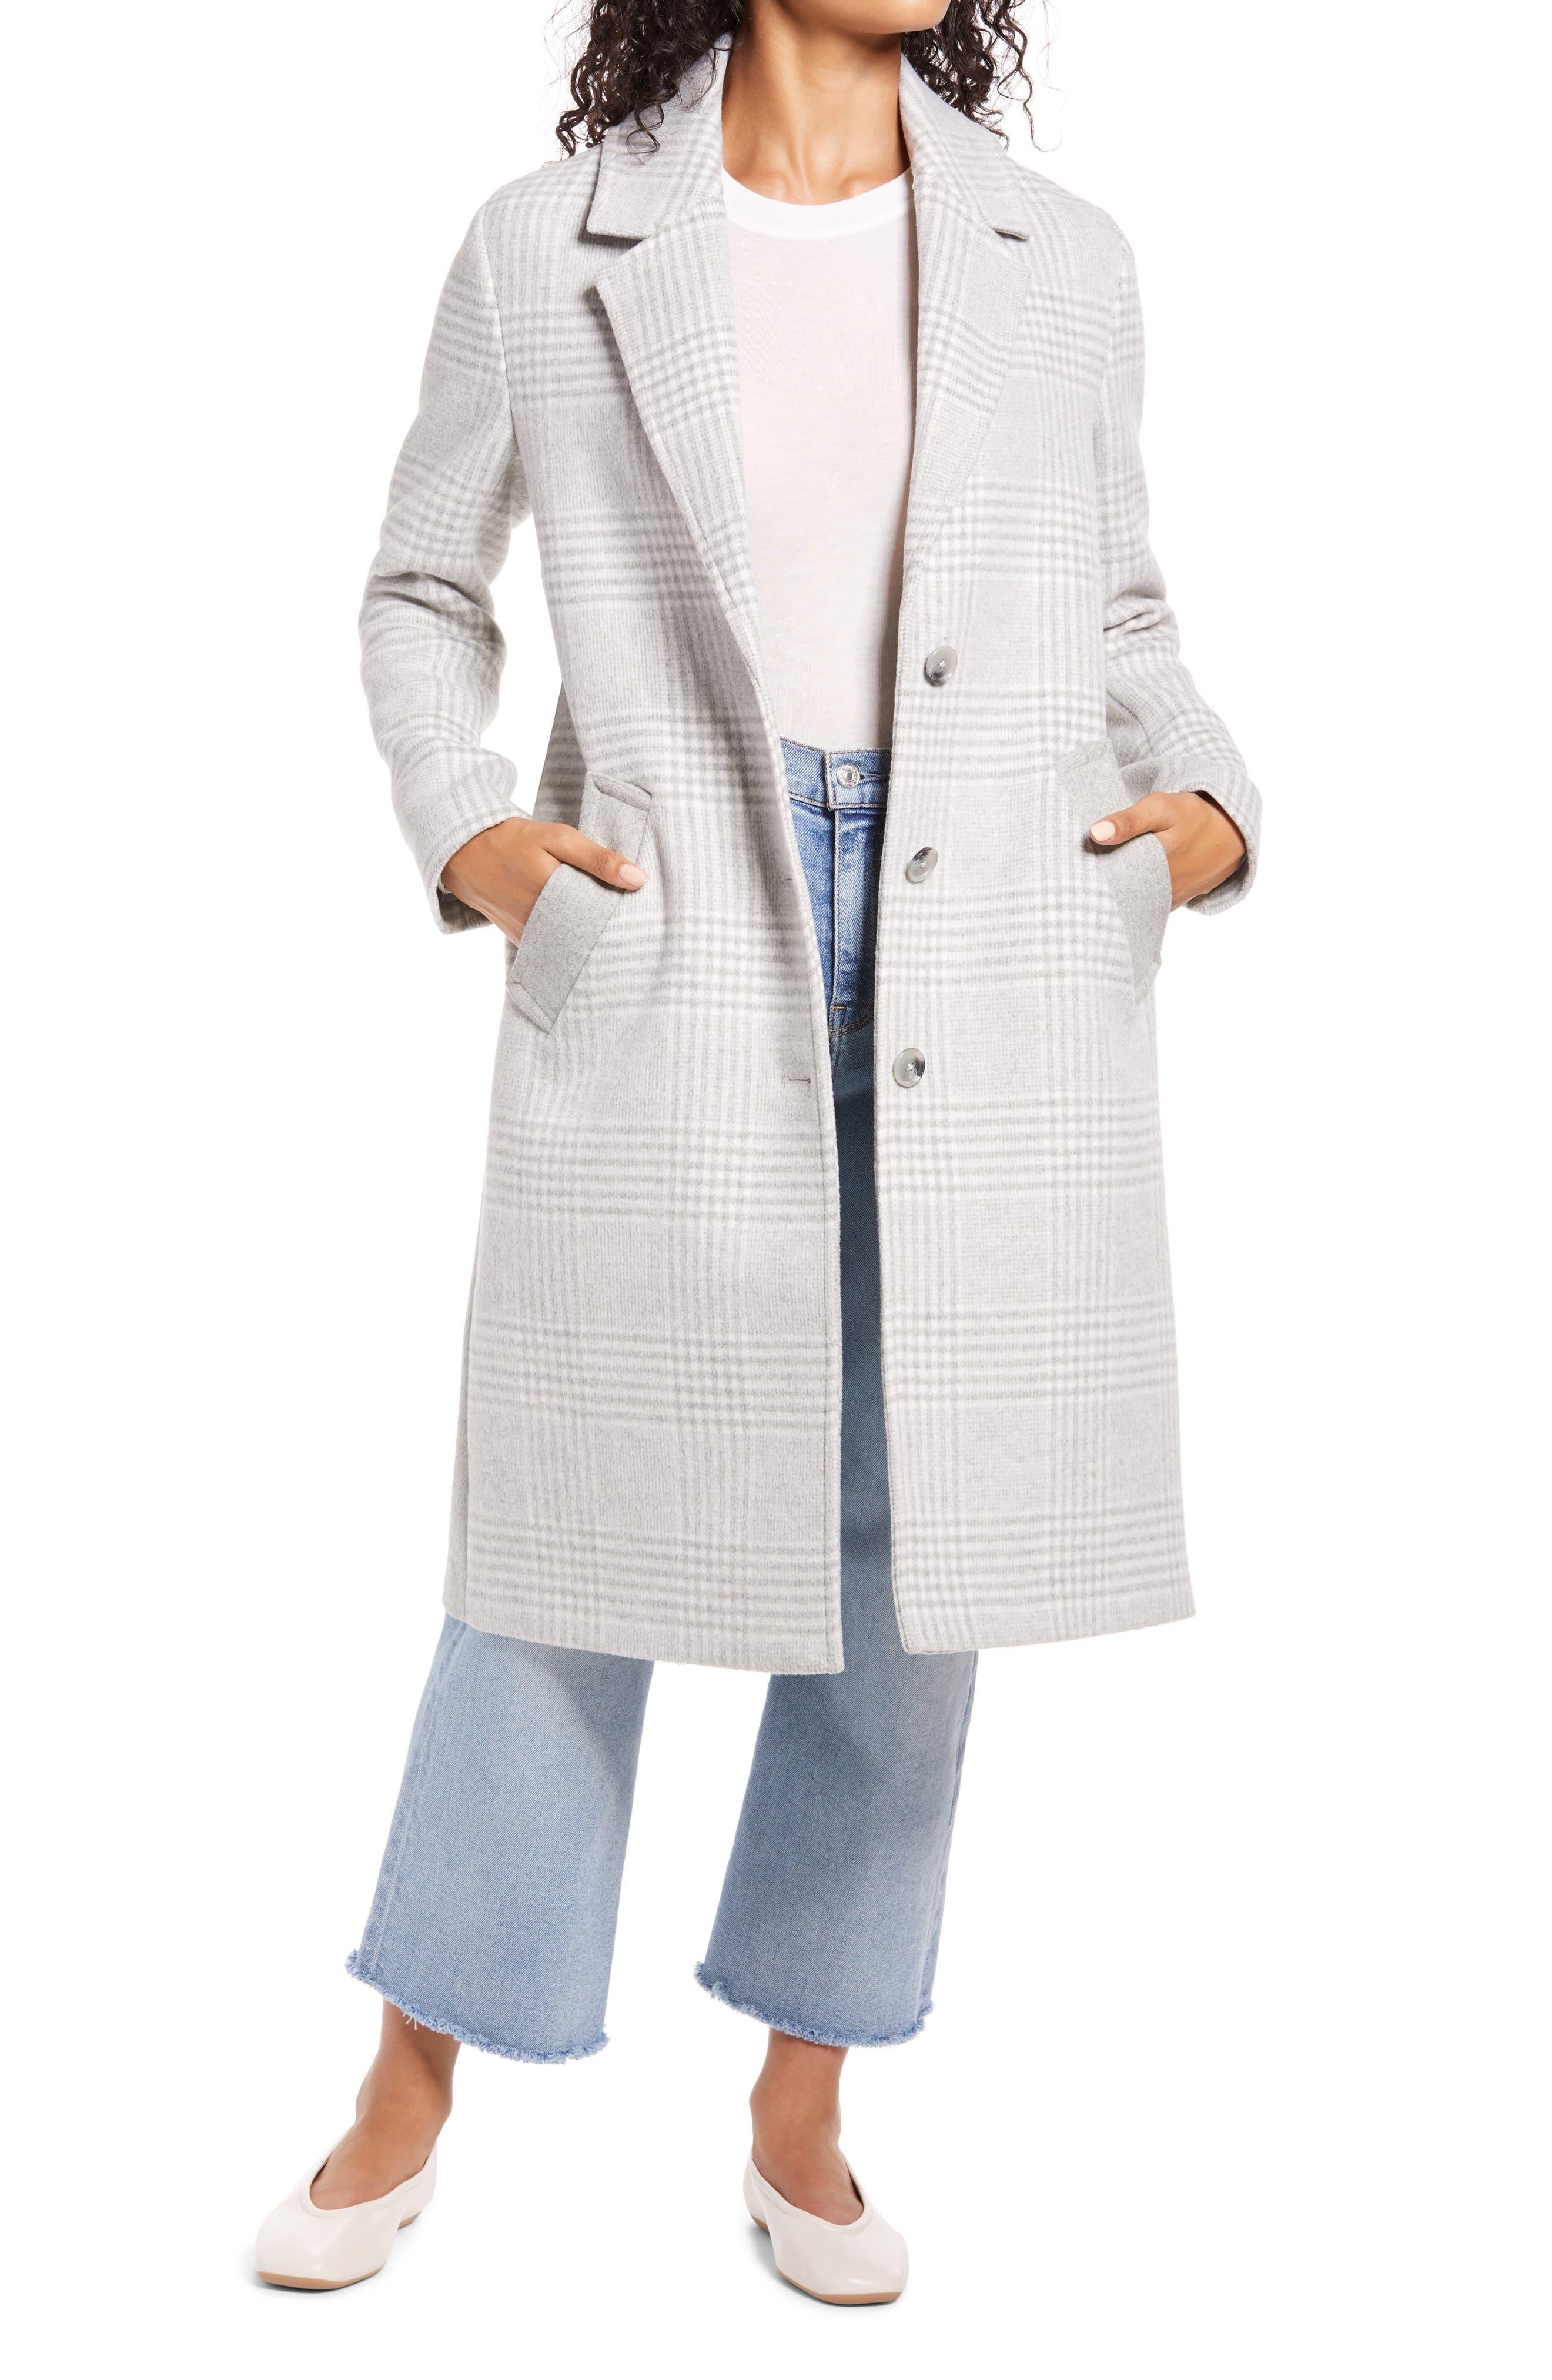 Women's Trench Coats & Jackets   Nordstrom